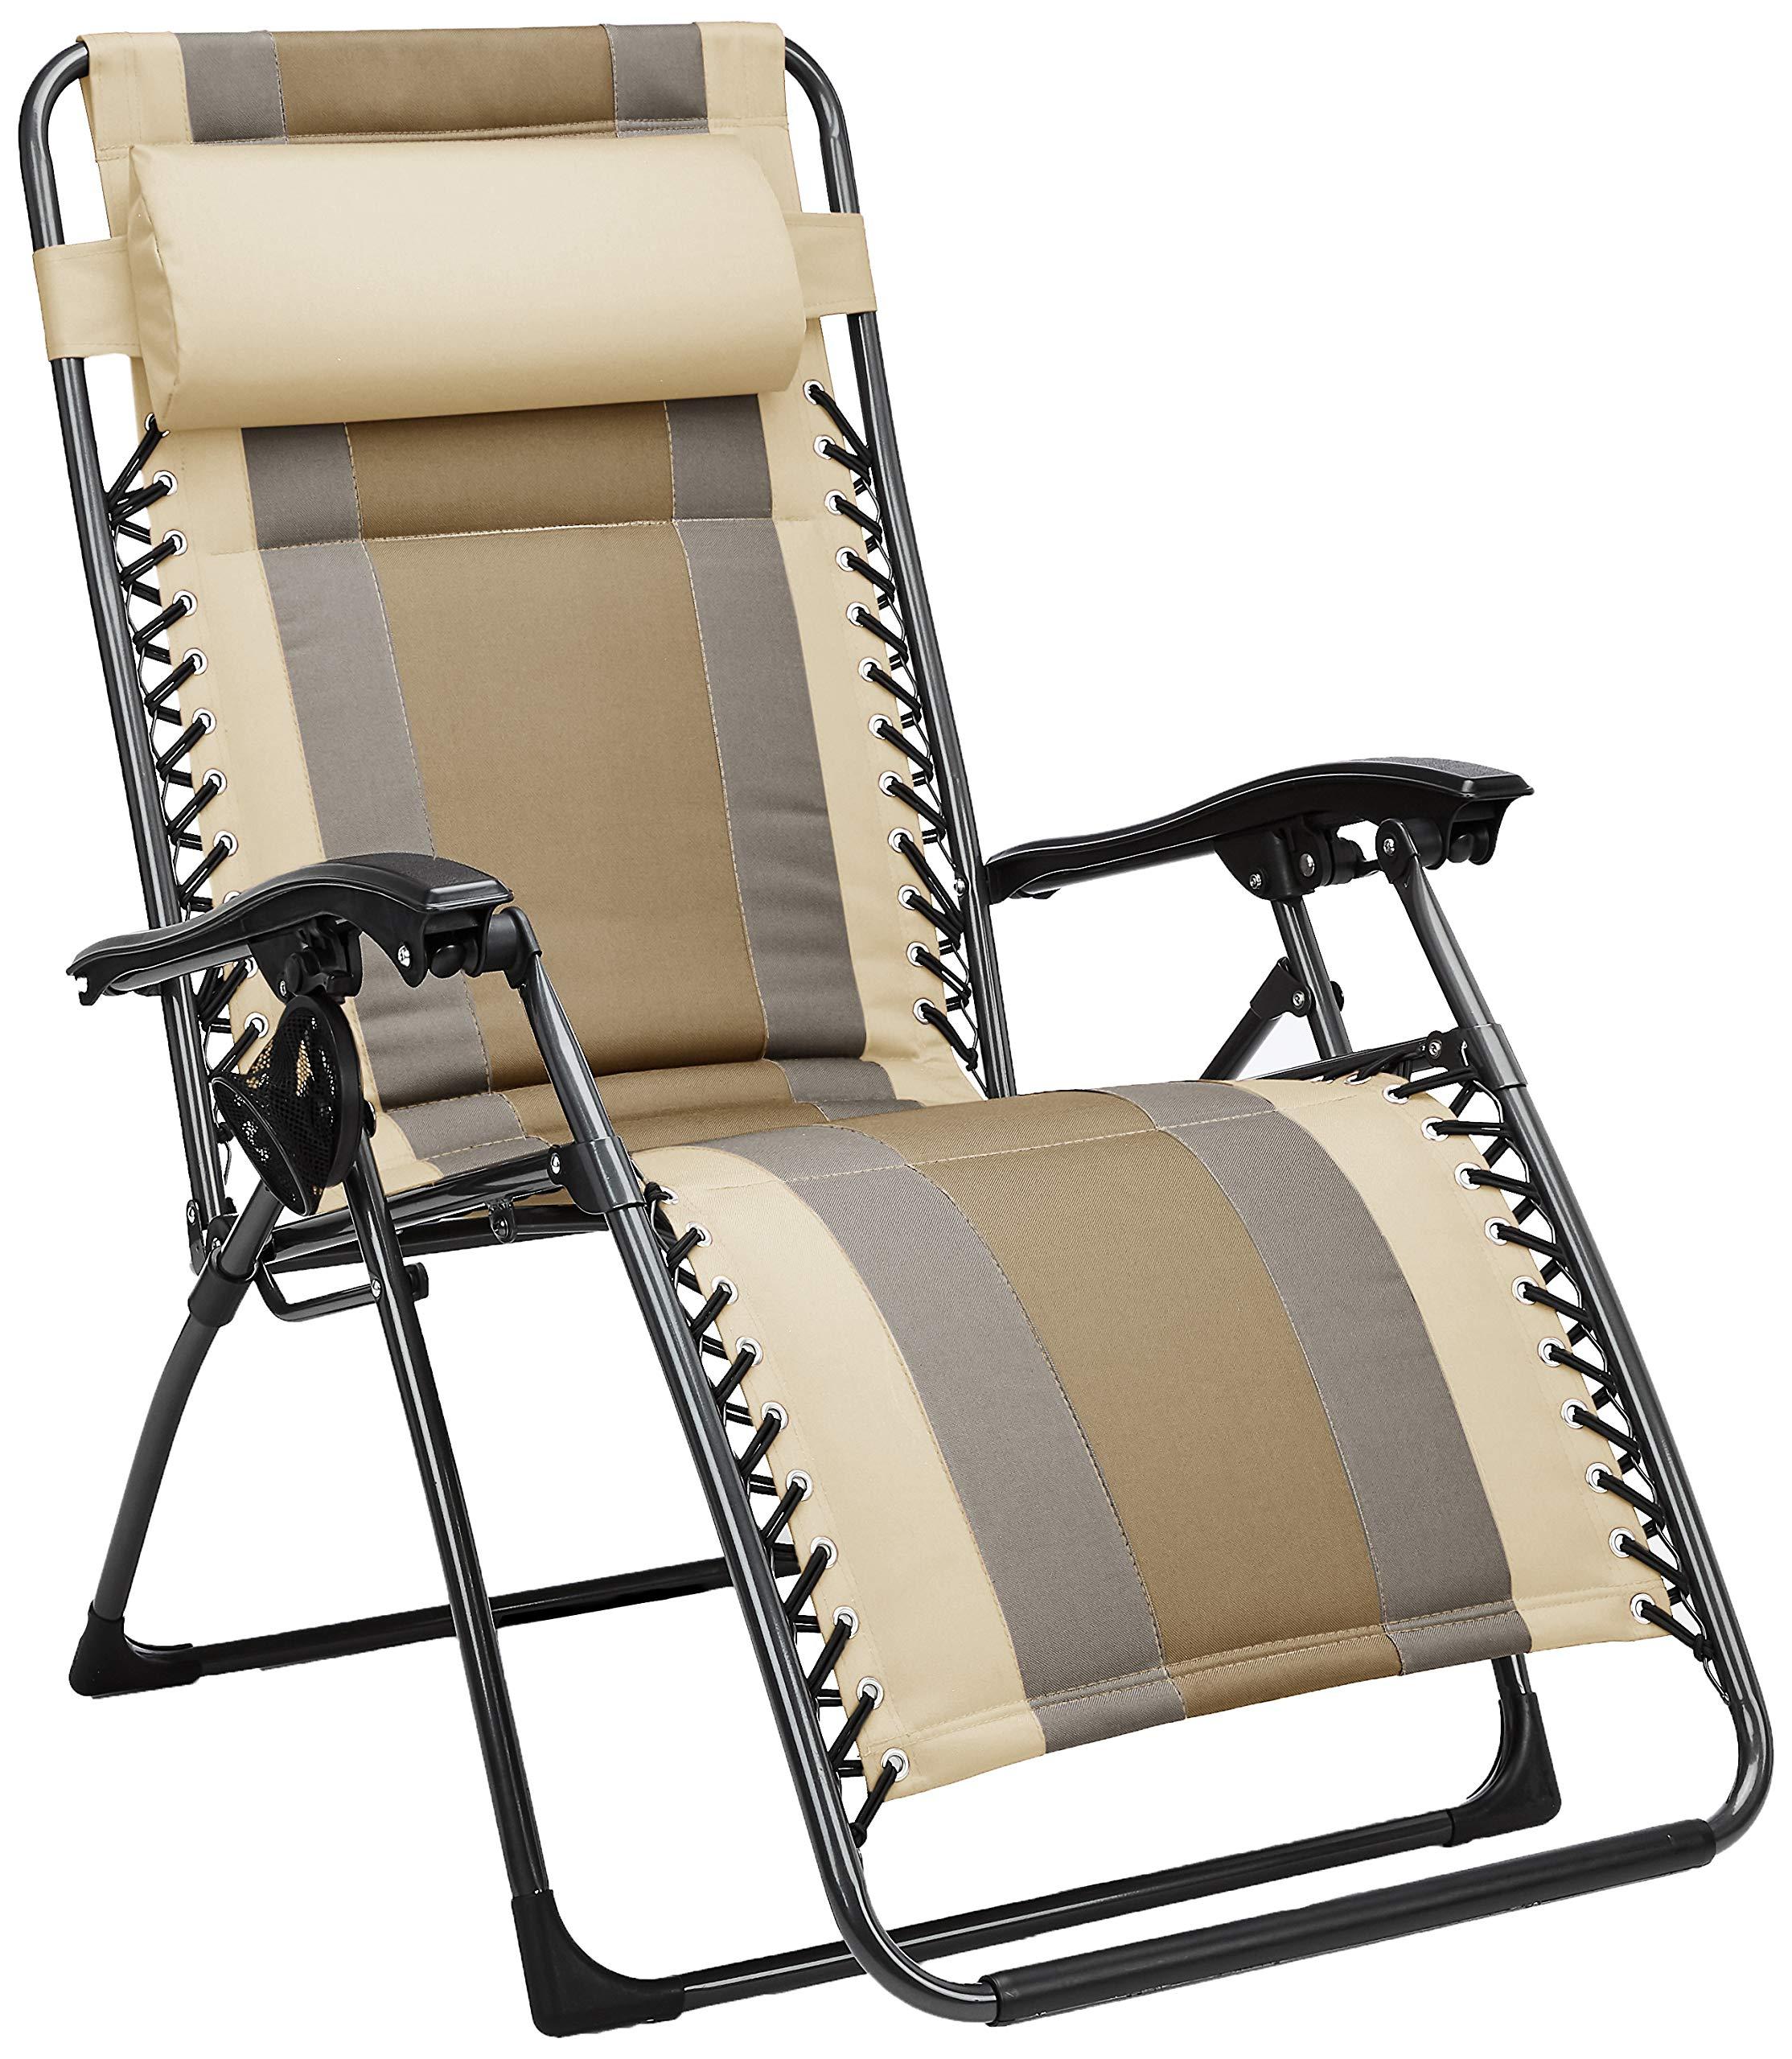 AmazonBasics Padded Zero Gravity Chair- Tan by AmazonBasics